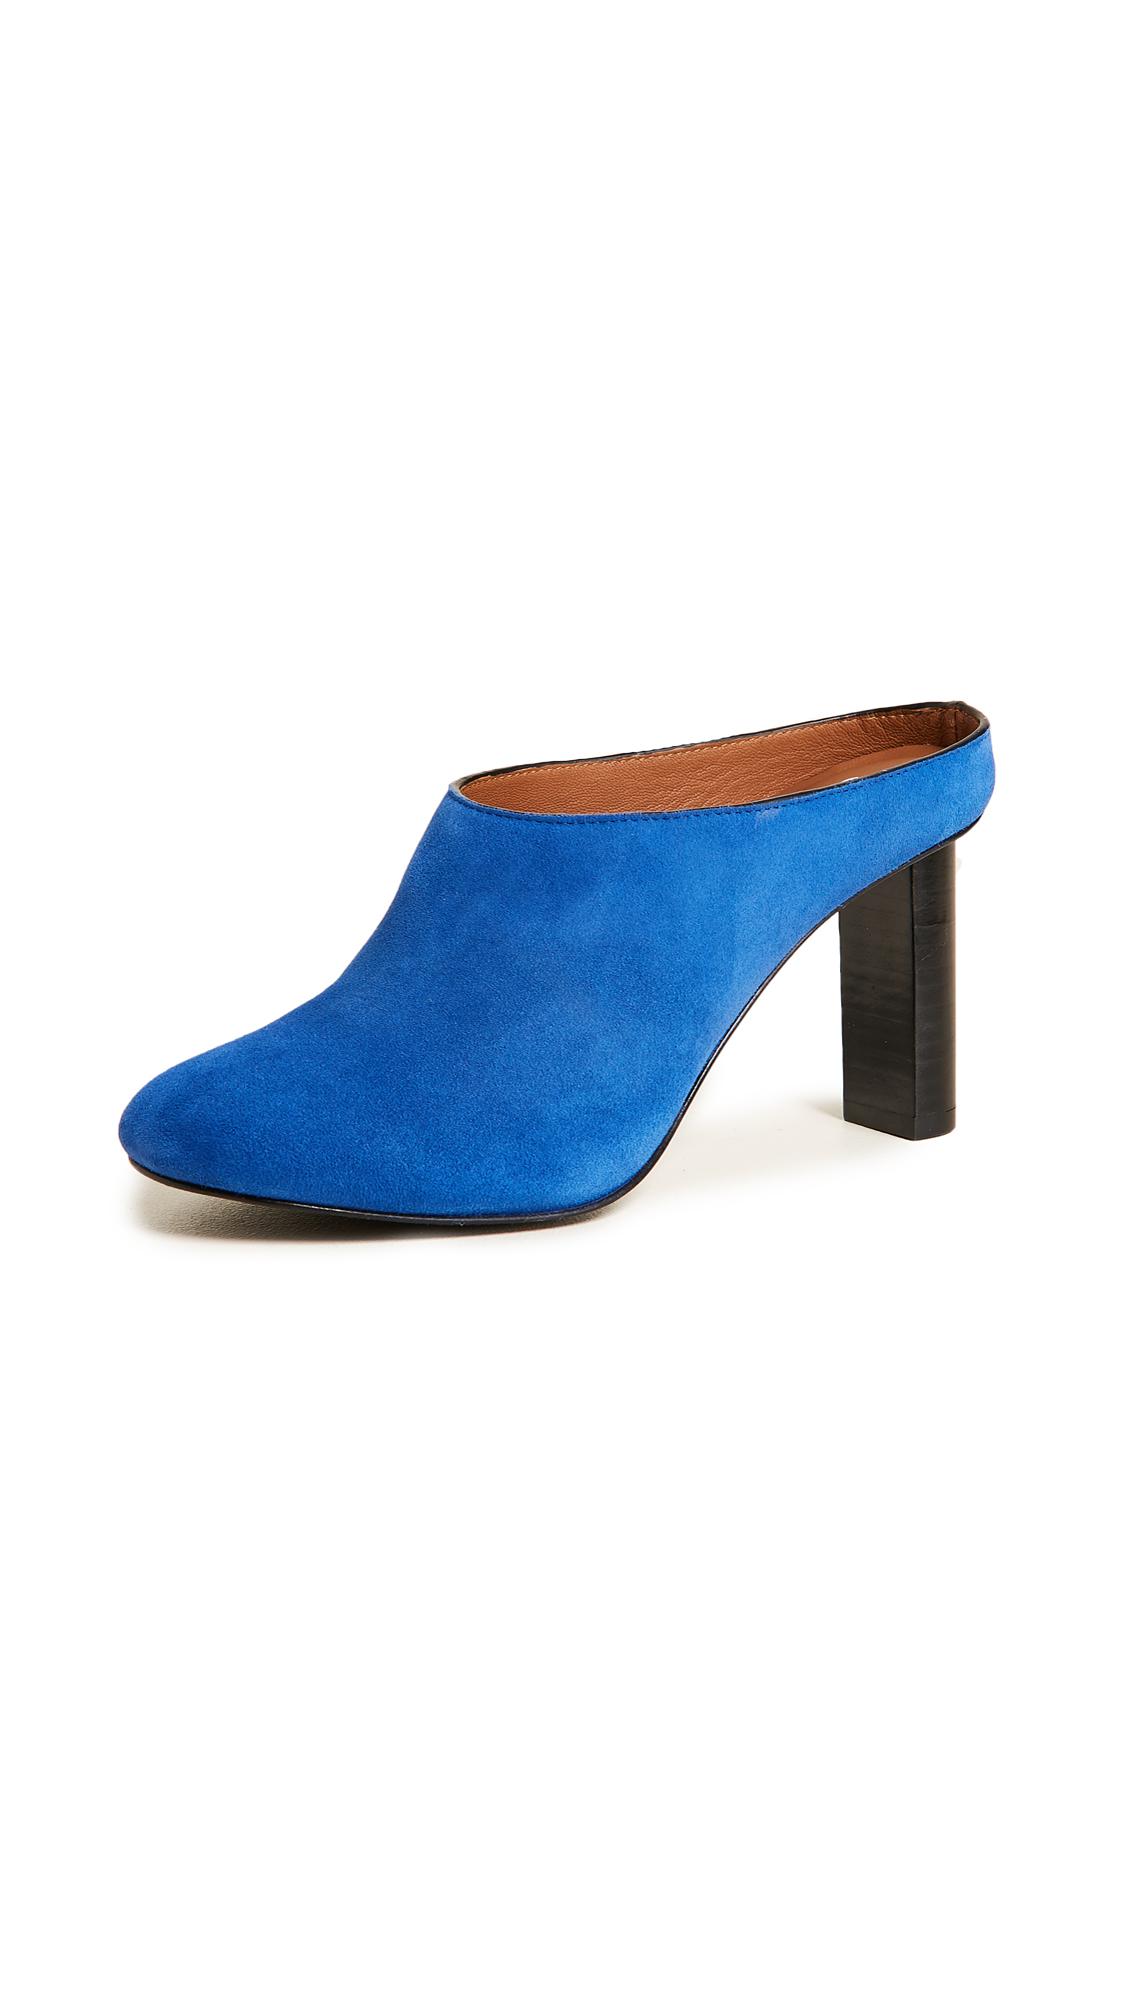 Joseph High Bardot Mules In Bright Blue